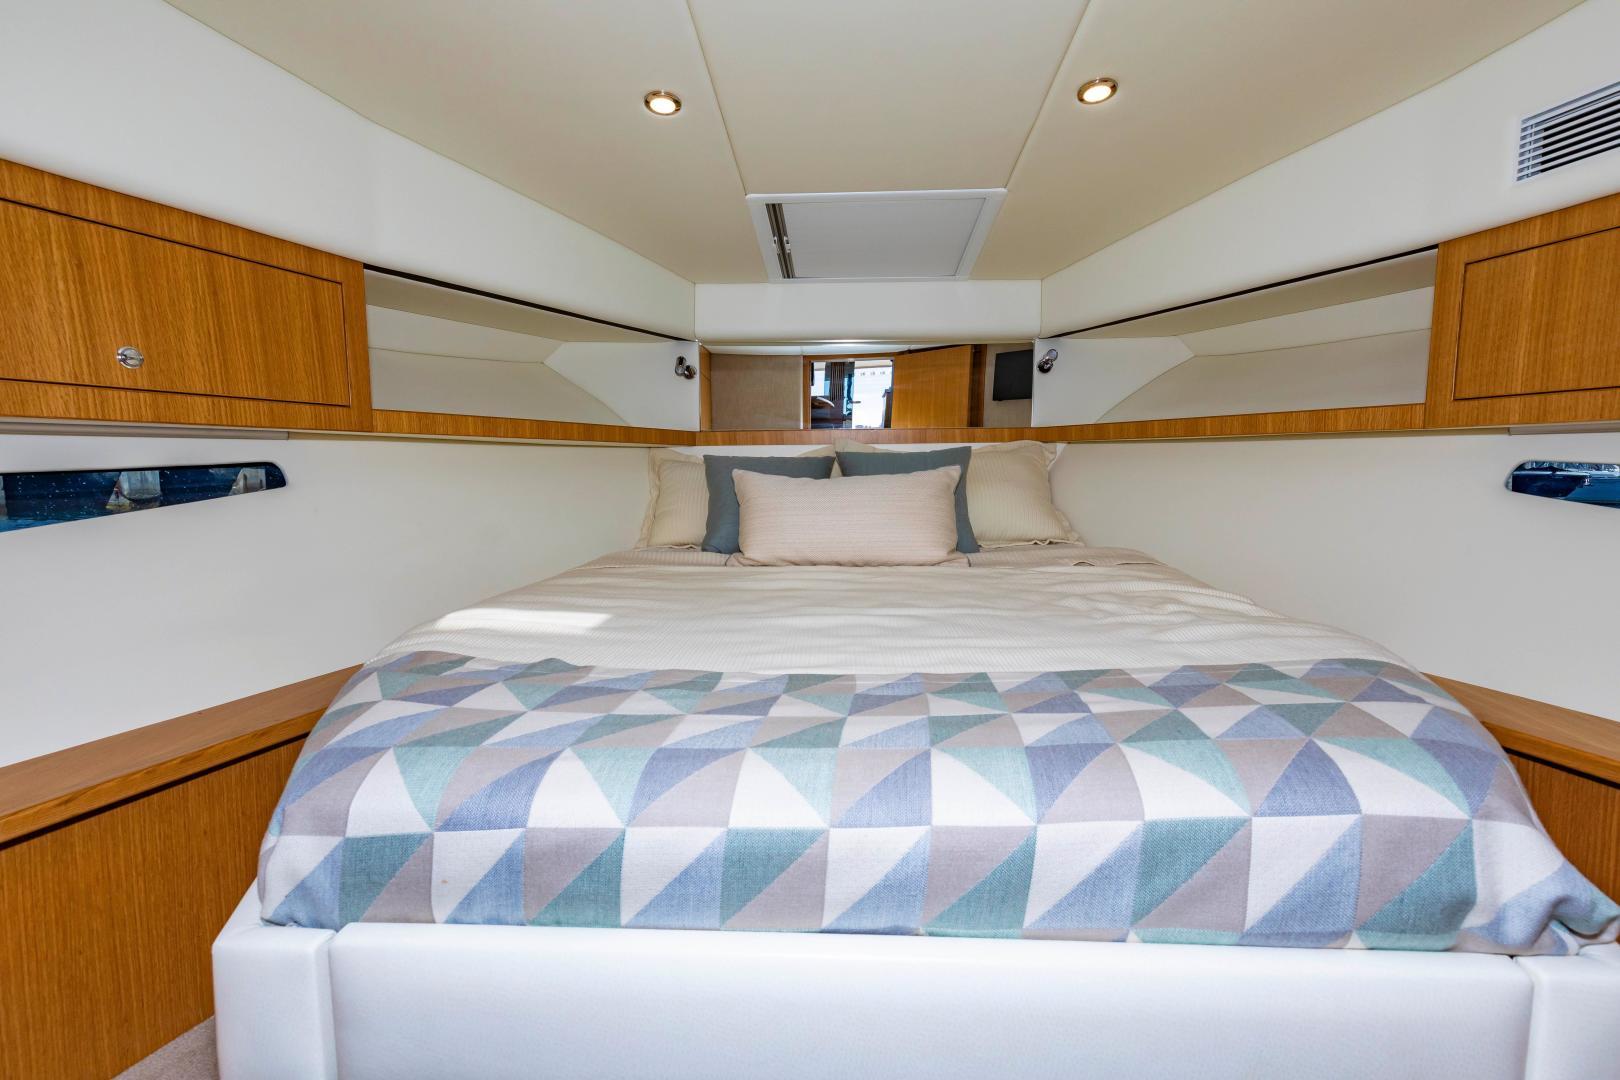 Riviera-395 SUV 2019-Ipanema Miami Beach-Florida-United States-1614908   Thumbnail